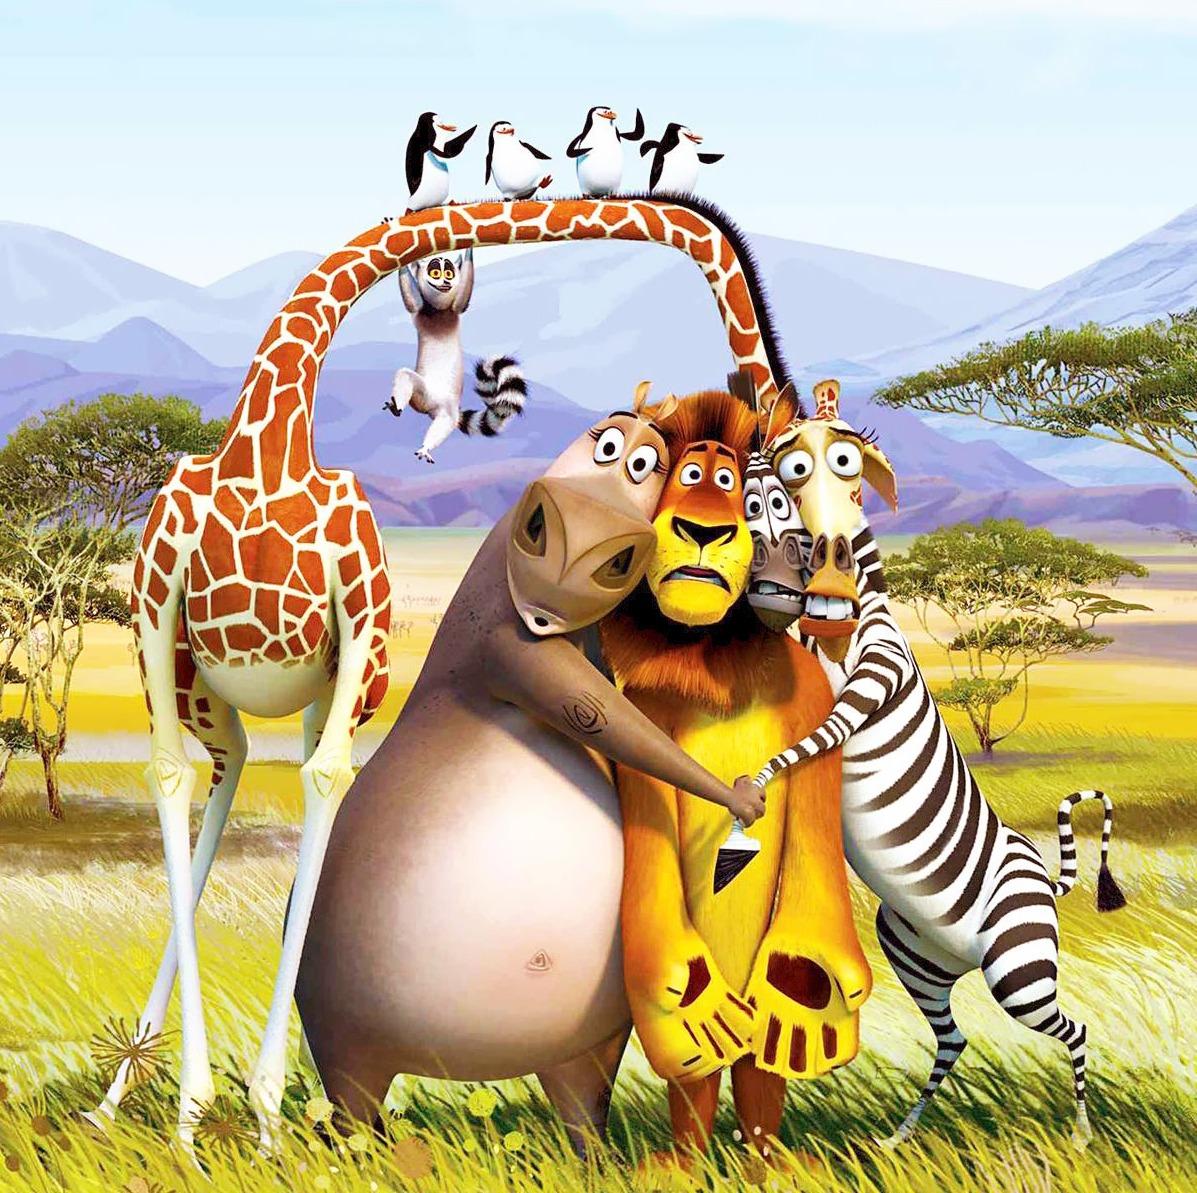 HD Madagascar Film Wallpapers and Photos | HD Cartoons Wallpapers